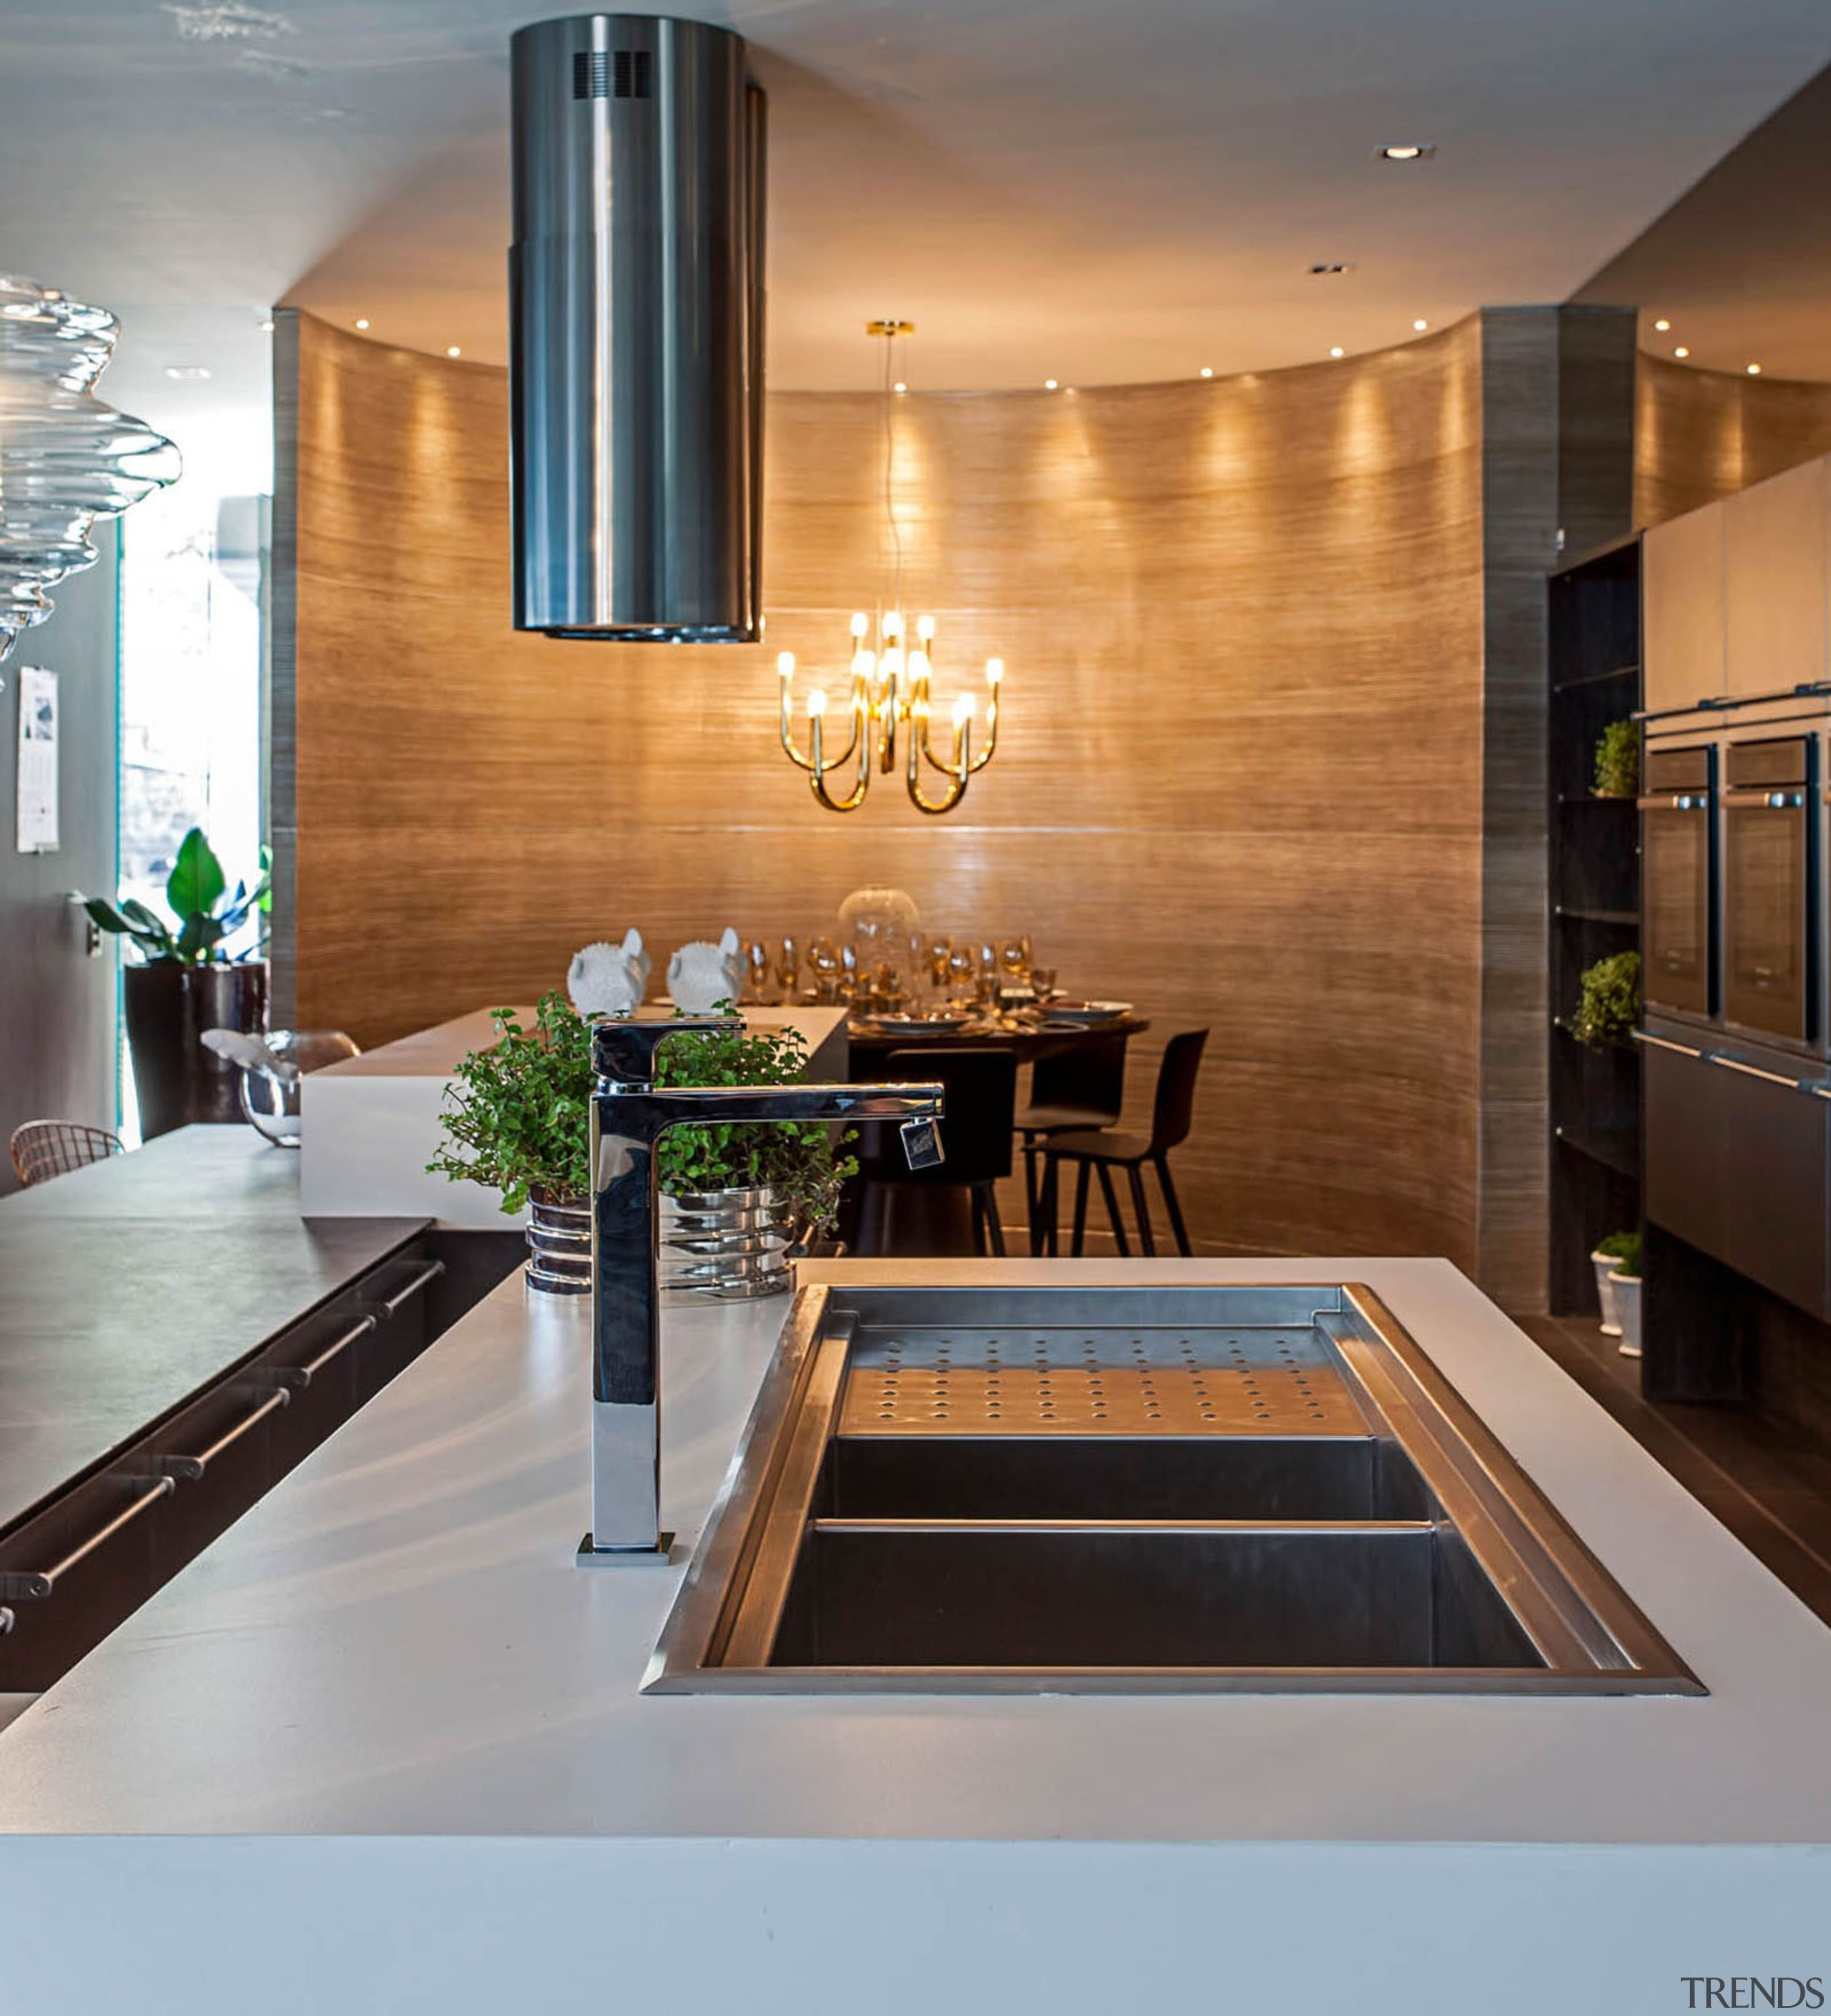 Blanco Zeus Cocina - Blanco Zeus Cocina - ceiling, countertop, interior design, gray